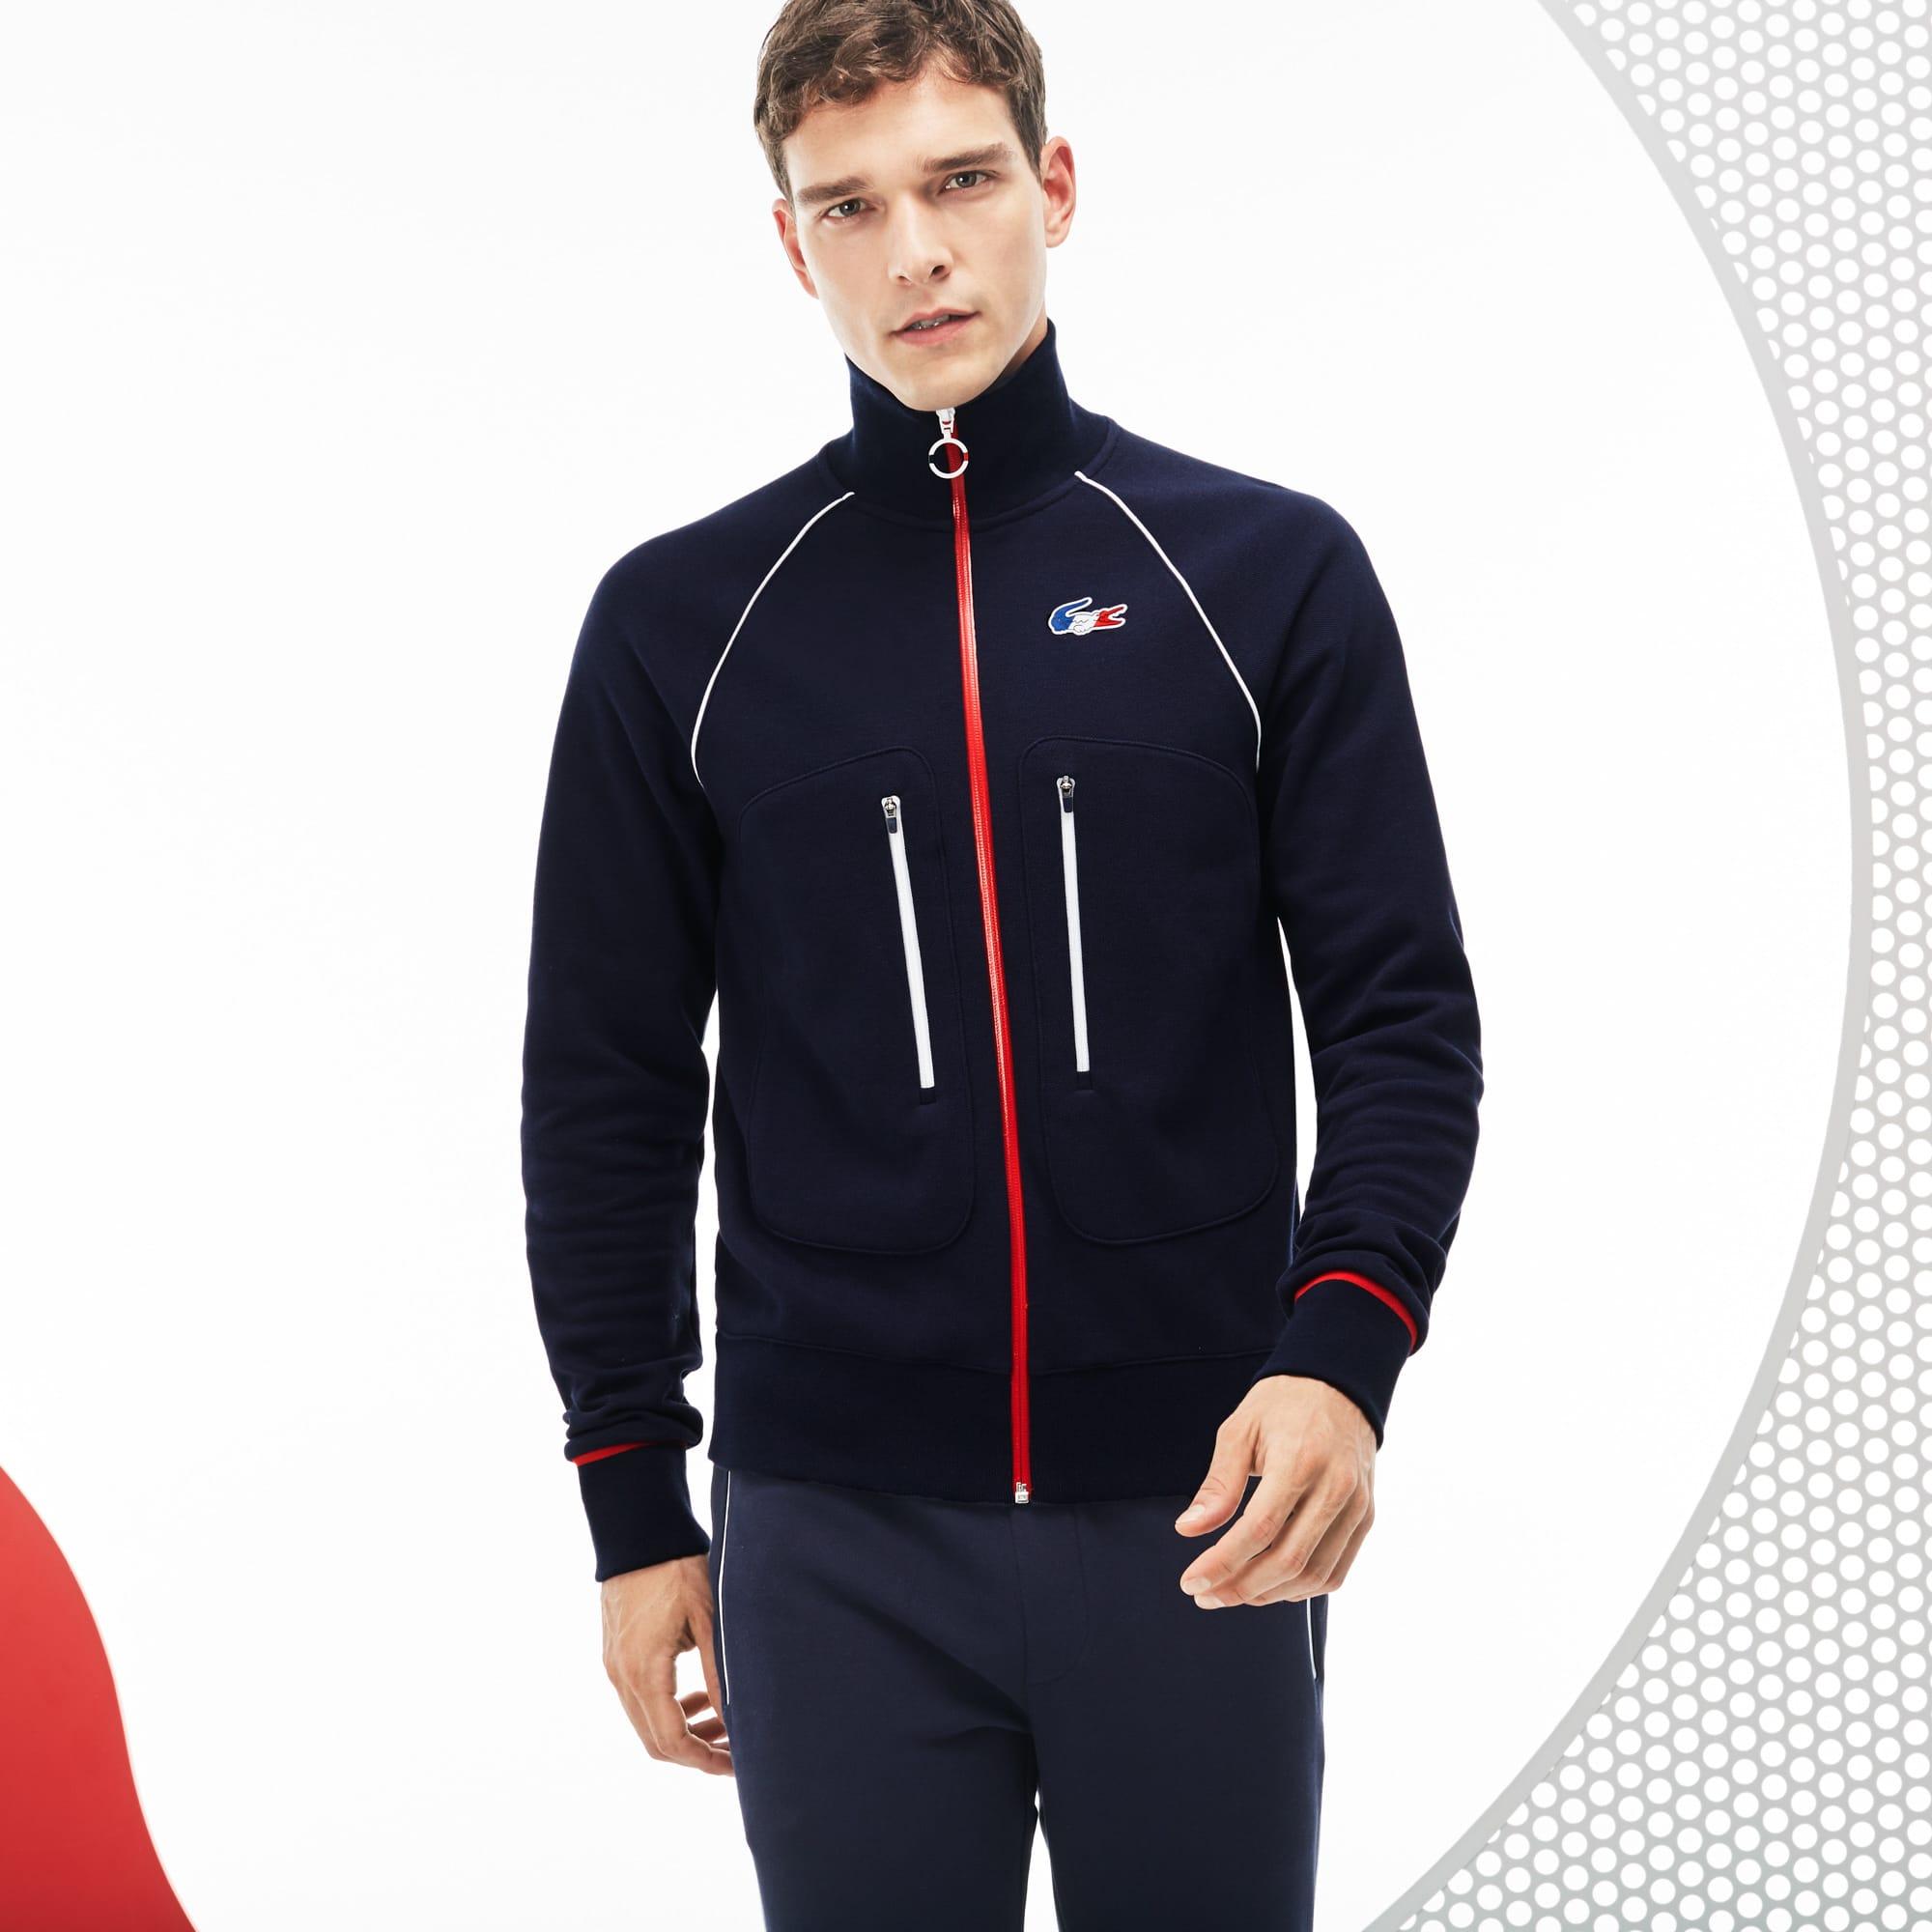 Men's French Sporting Spirit Edition Zippered Fleece Sweatshirt